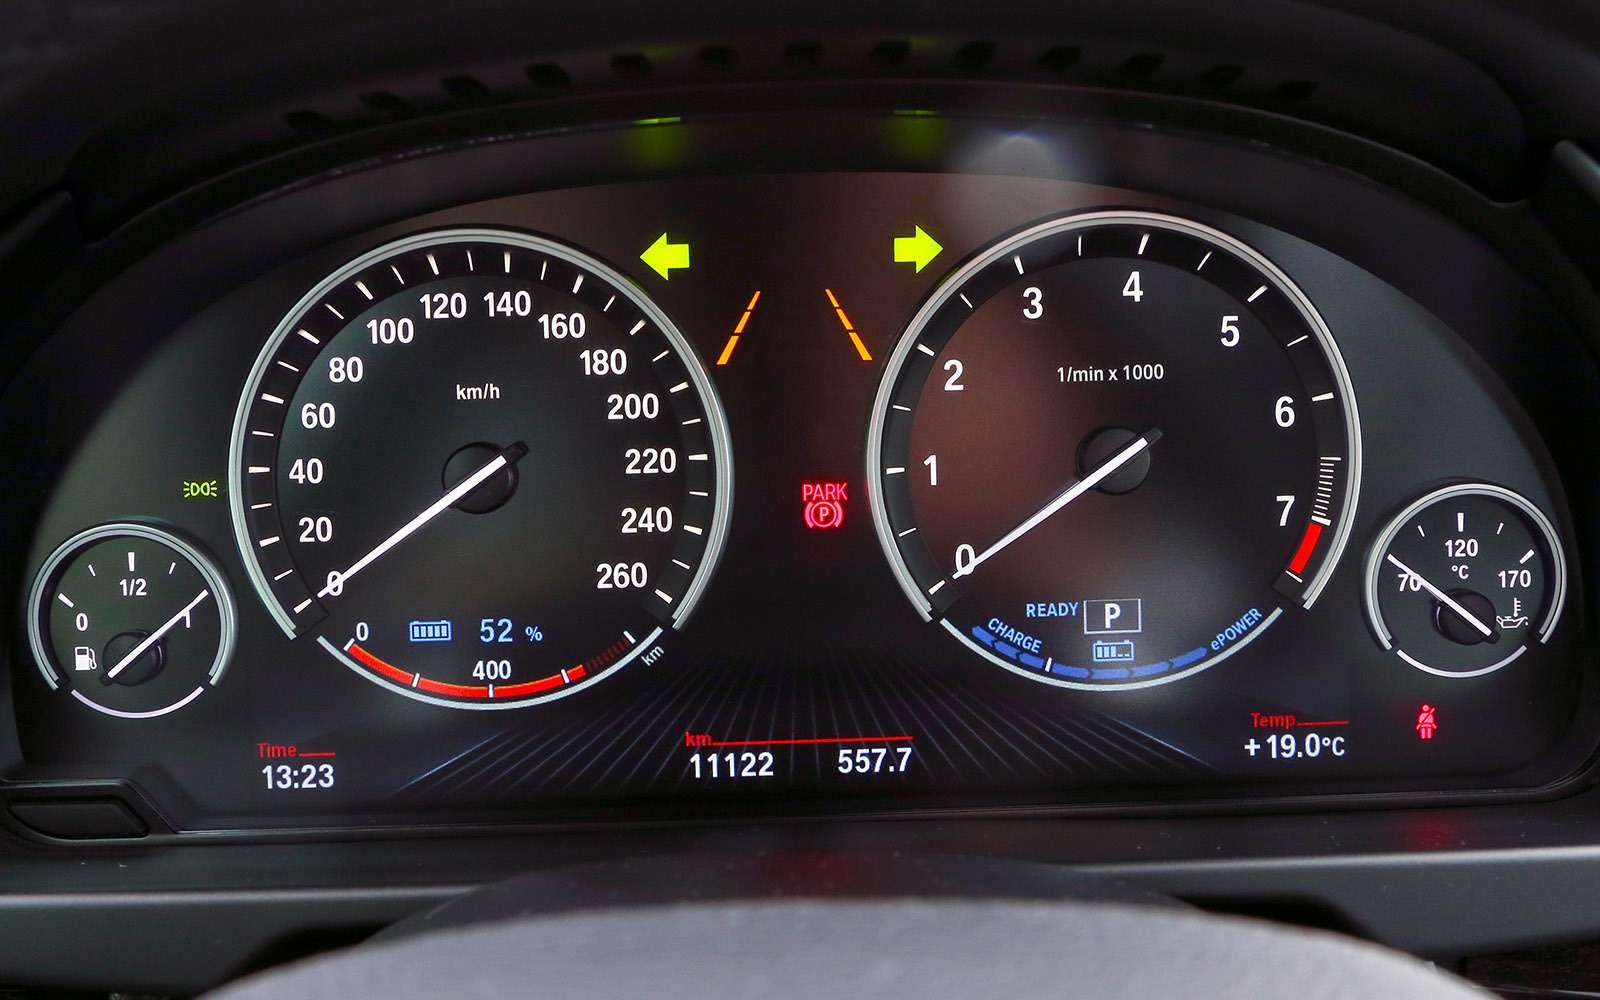 Новый Land Rover Discovery против конкурентов— тест ЗР— фото 784687